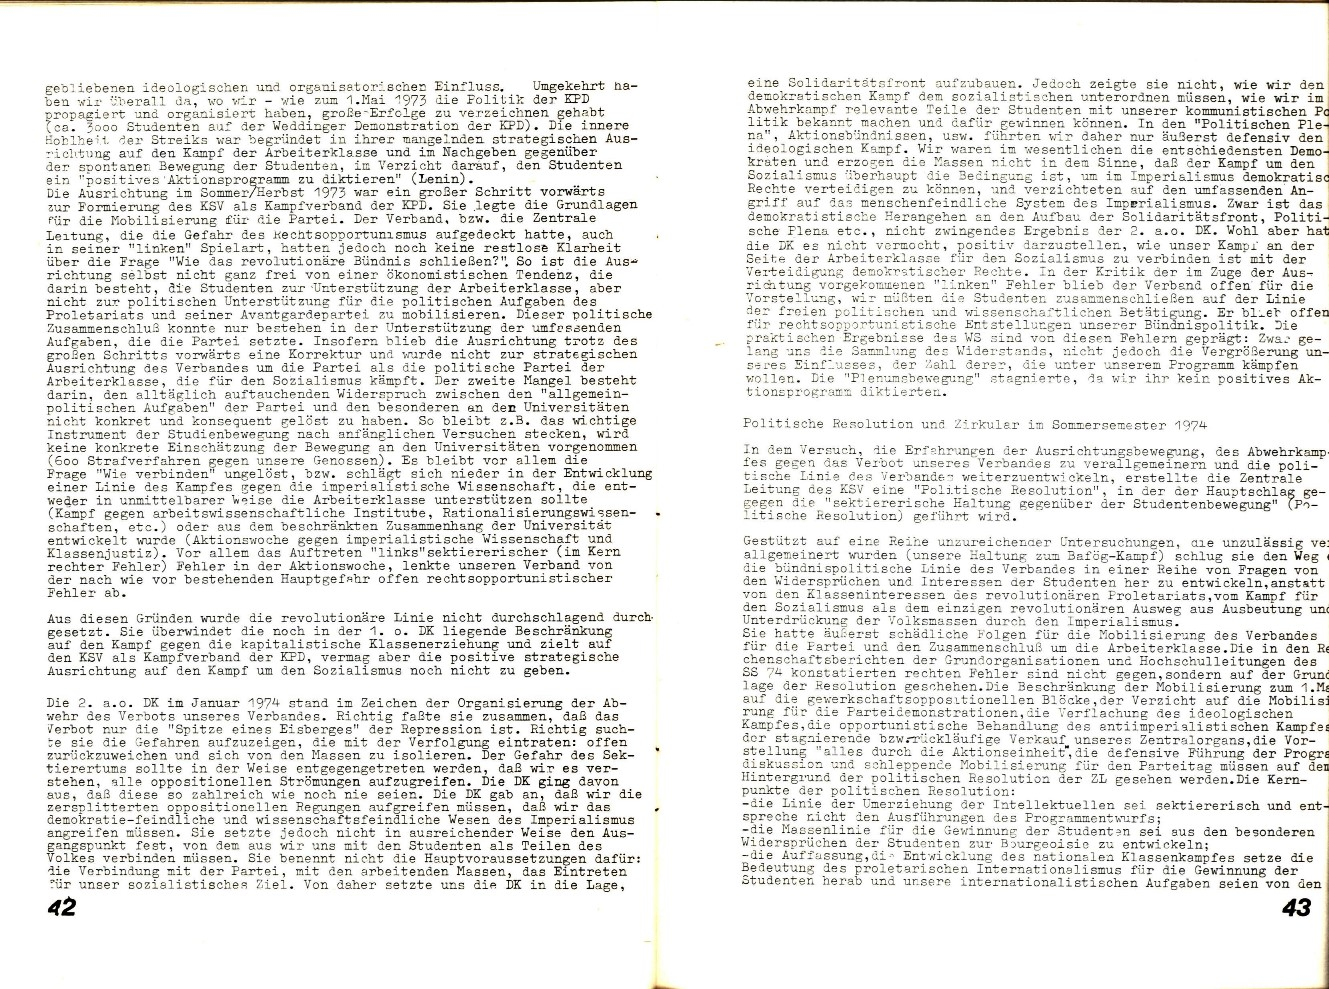 KSV_1974_Rechenschaftsbericht_23